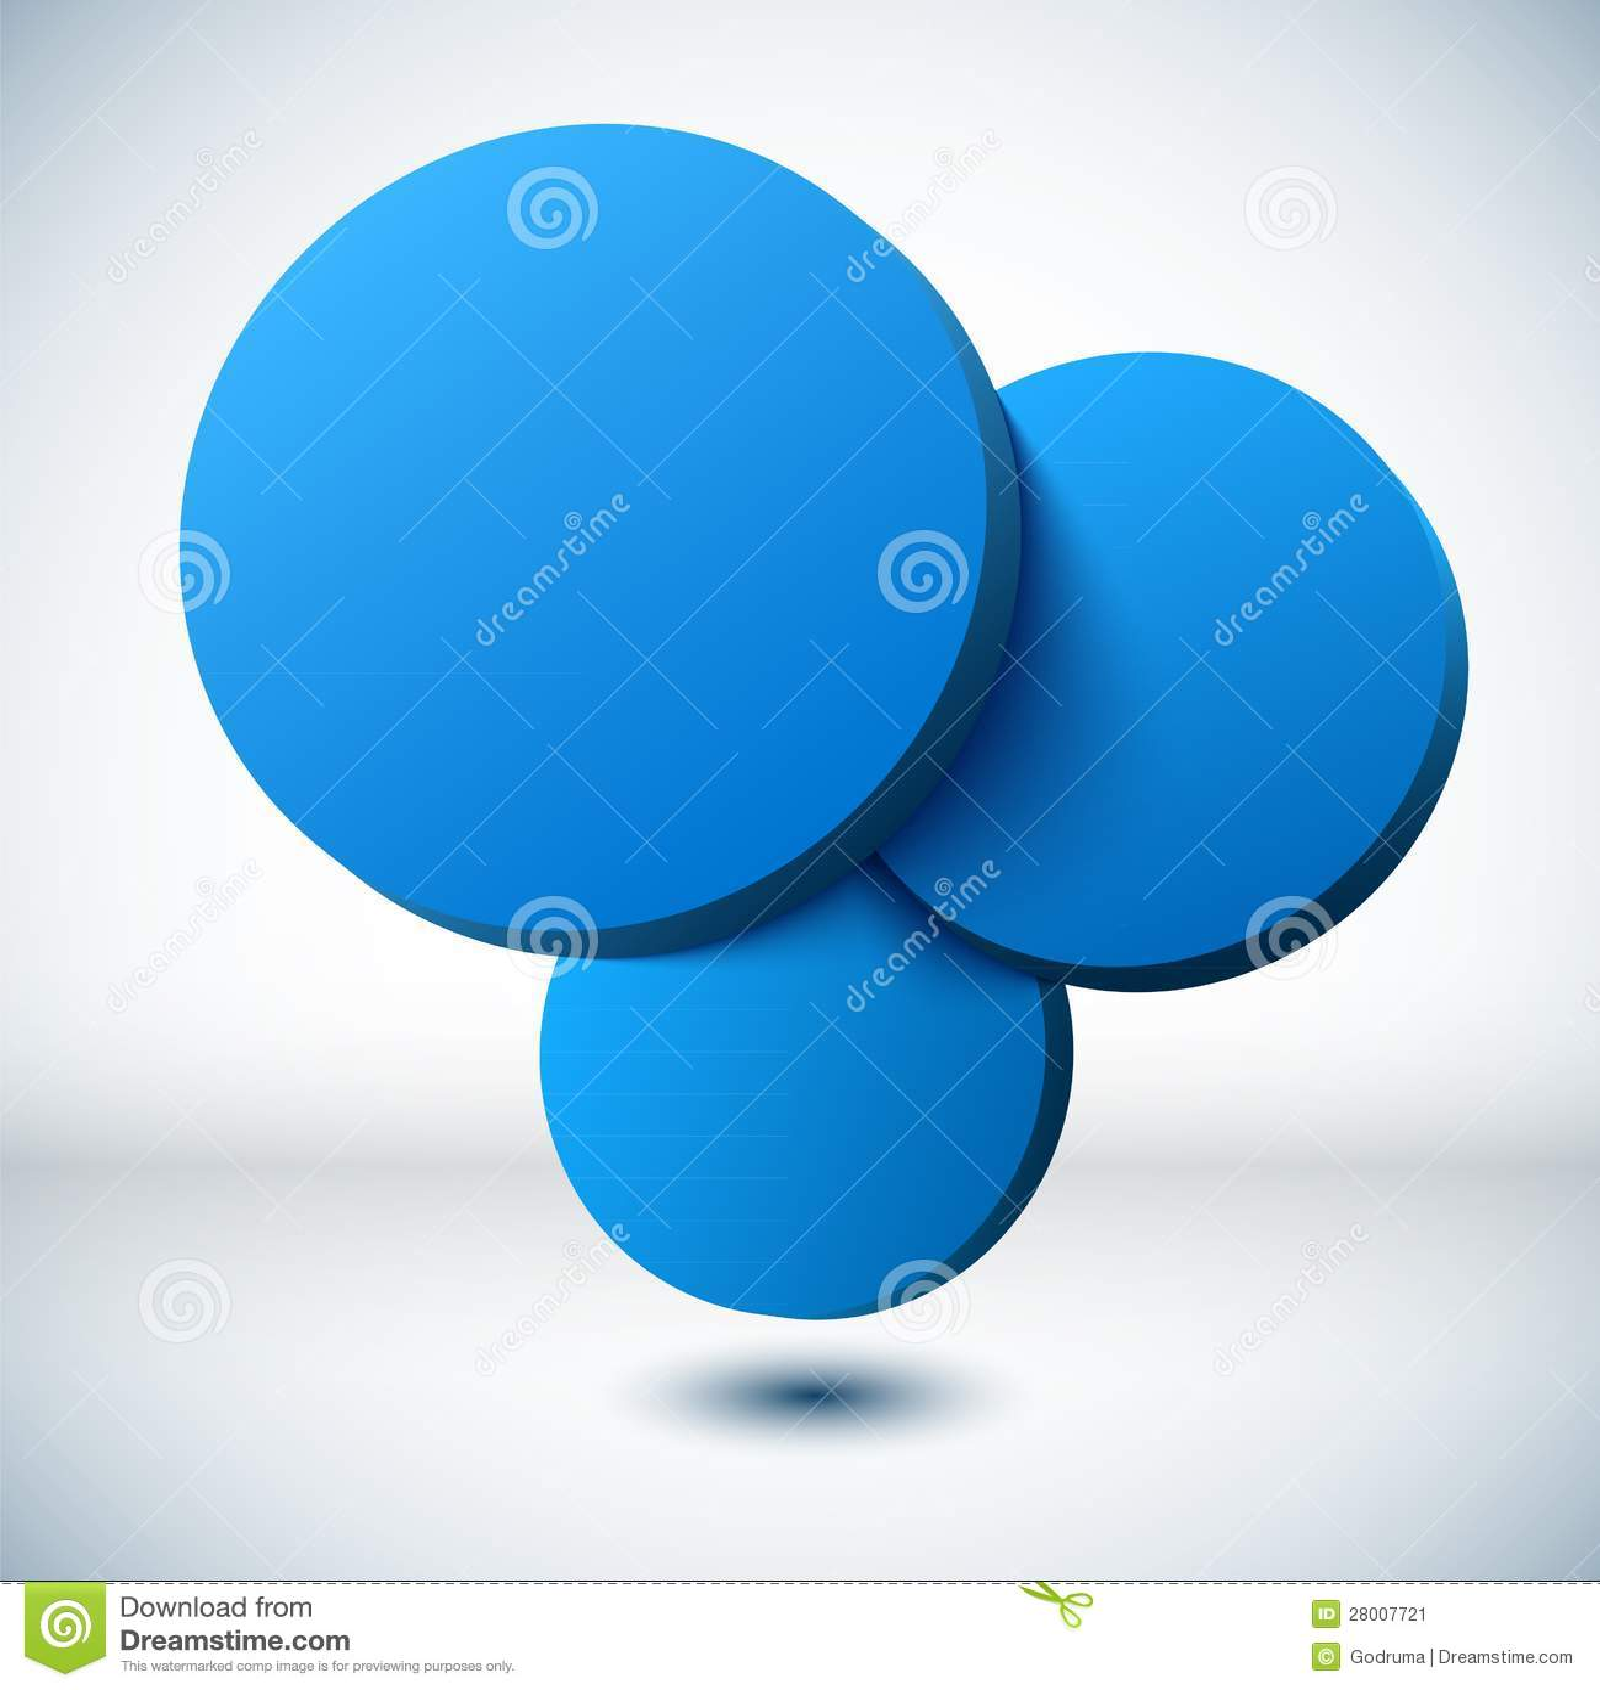 Blue 3D Circle Background. Stock Image